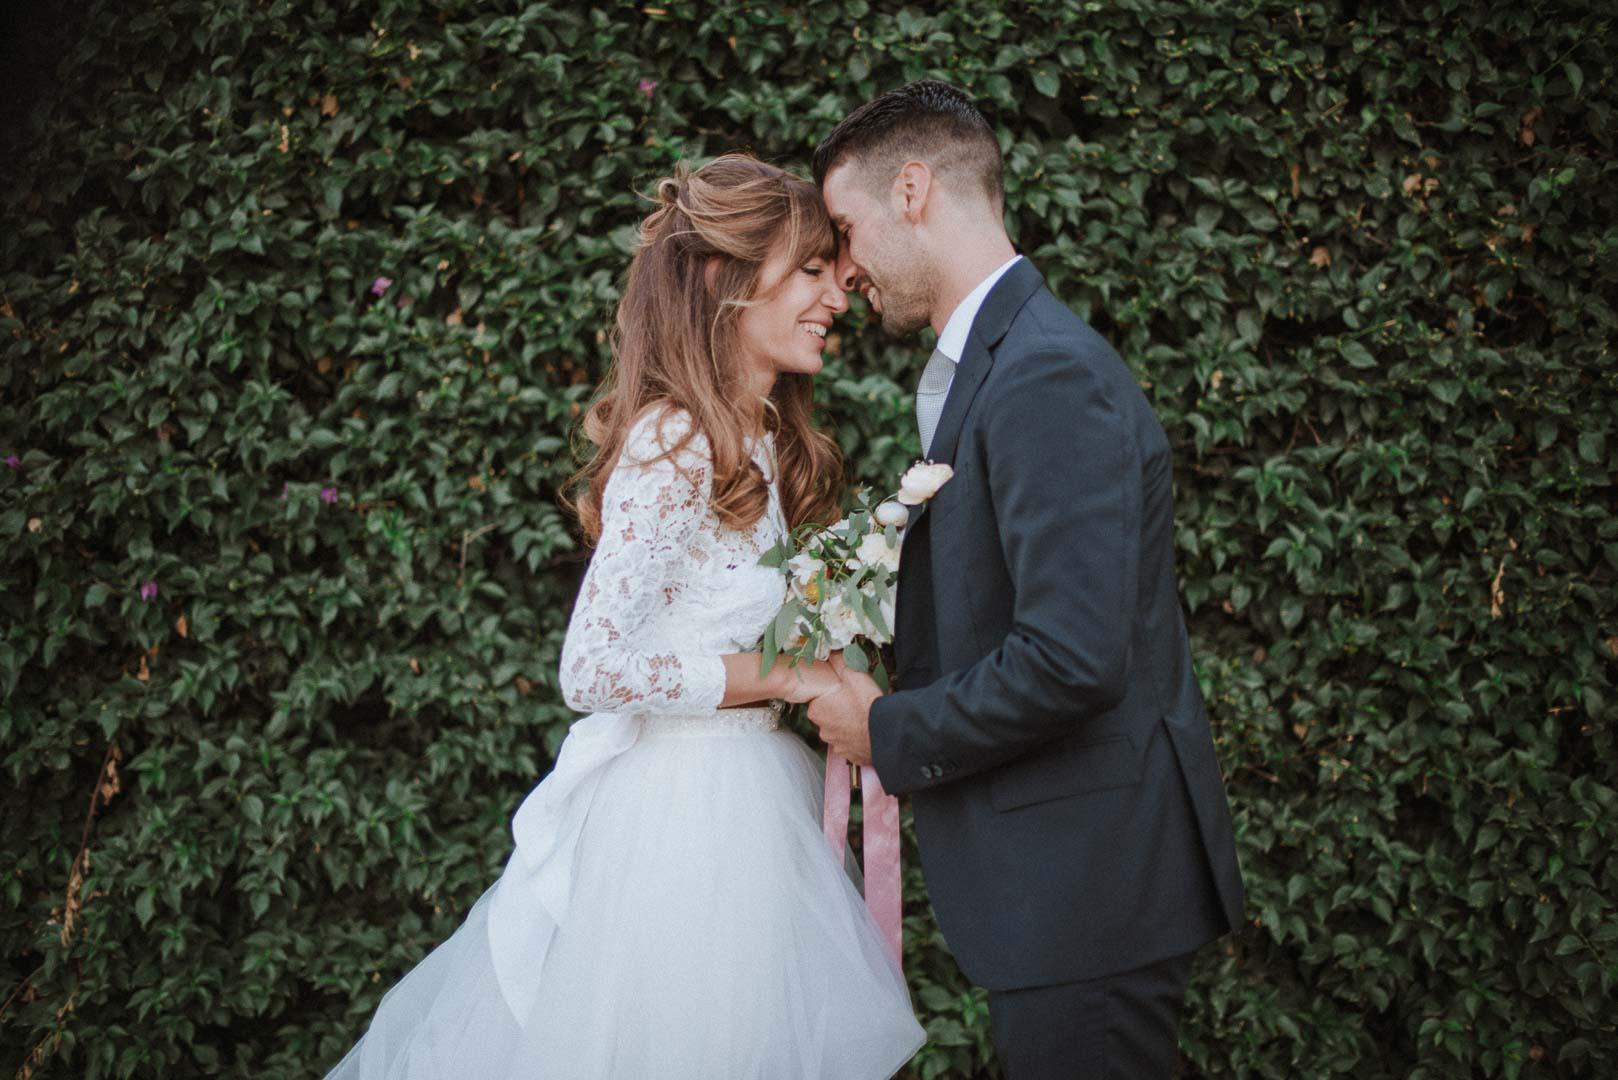 wedding-photographer-destination-fineart-bespoke-reportage-napoli-nabilah-vivianeizzo-spazio46-96